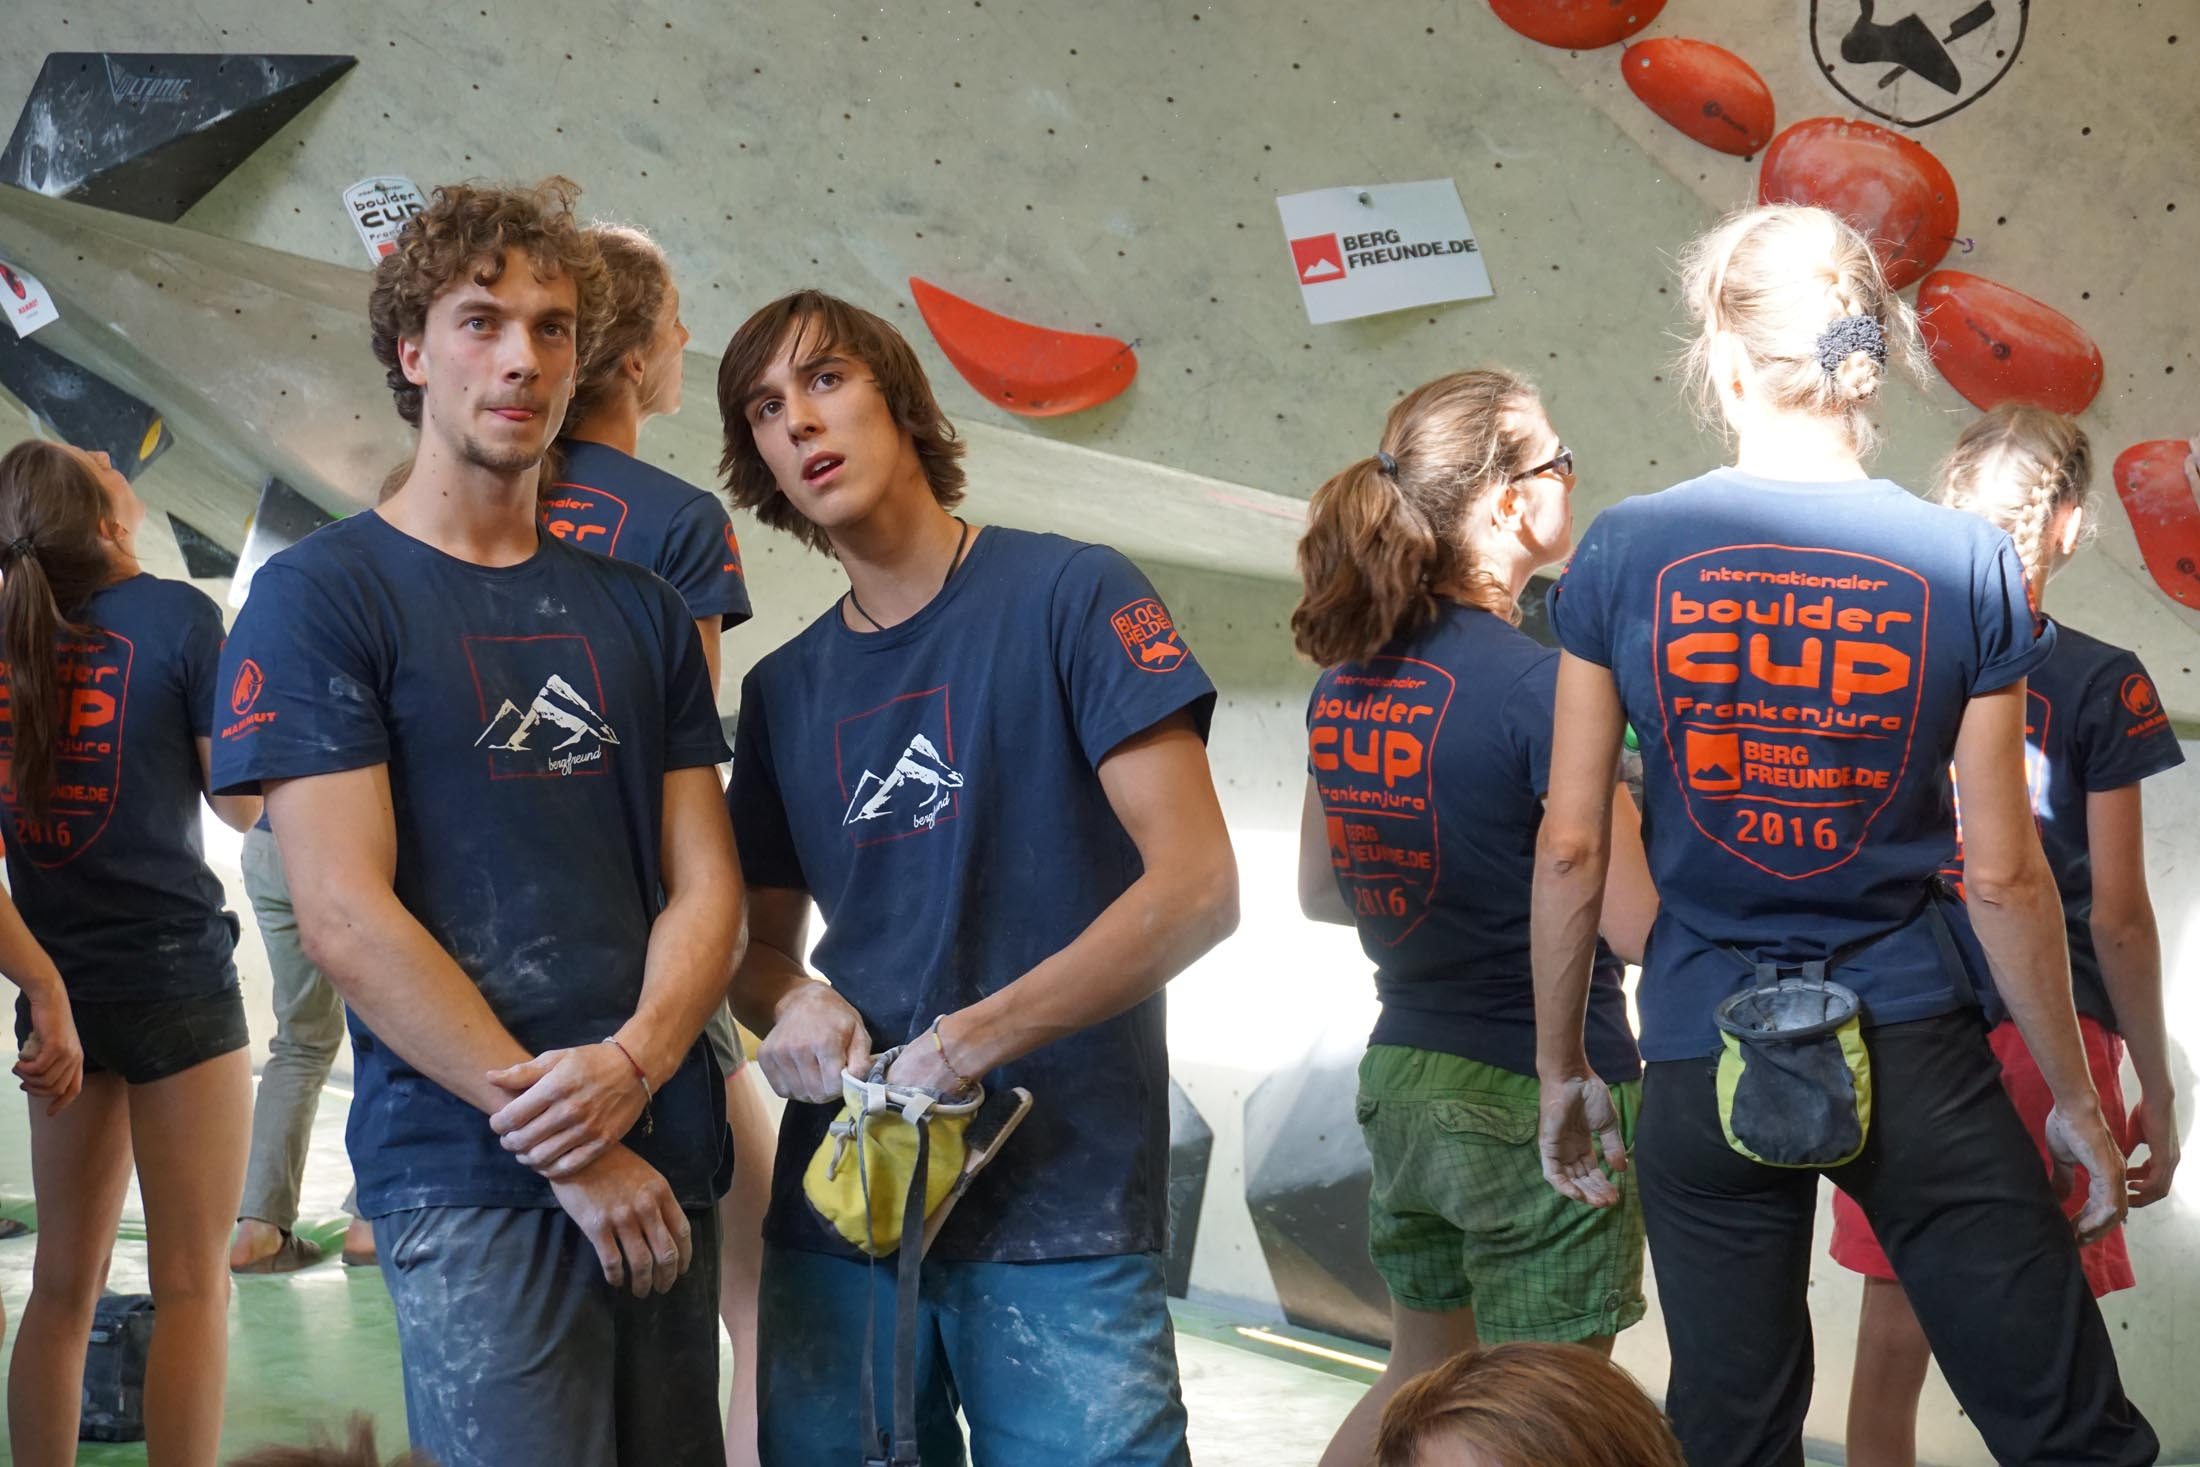 Finale, internationaler bouldercup Frankenjura 2016, BLOCKHELDEN Erlangen, Mammut, Bergfreunde.de, Boulderwettkampf07092016454